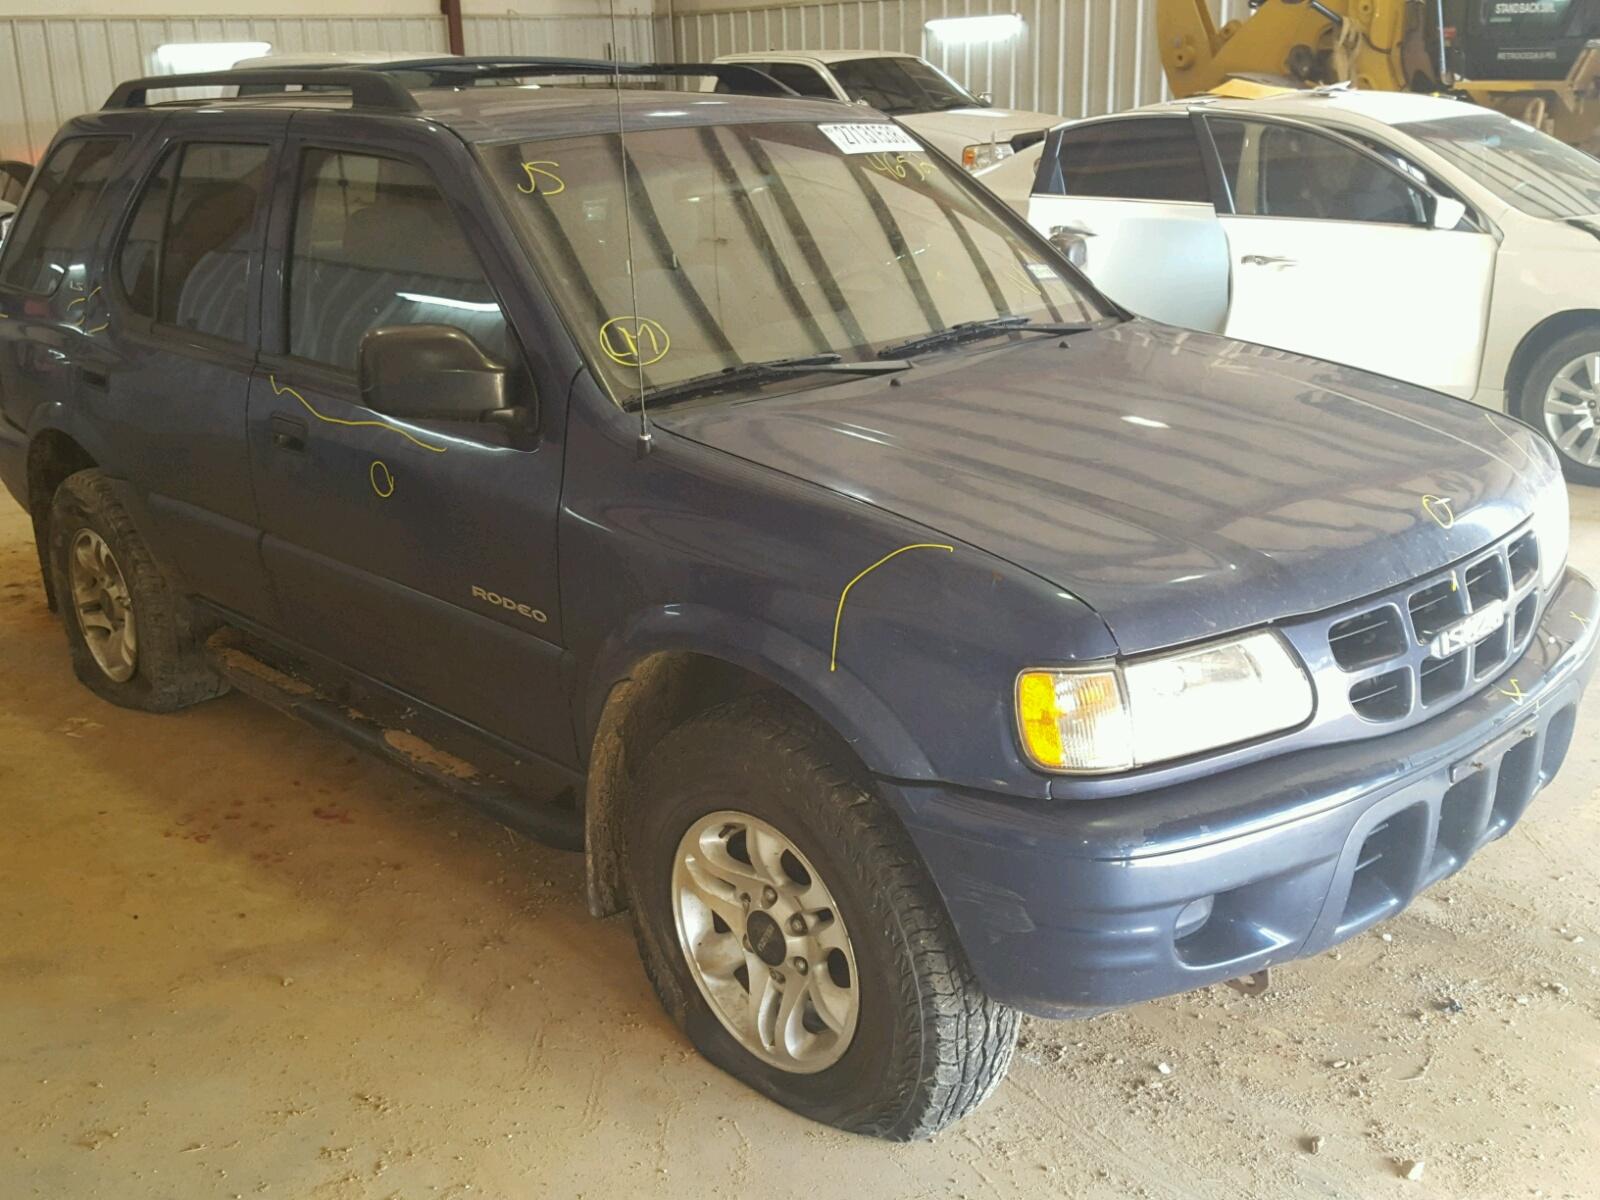 2002 ISUZU RODEO S 3.2L